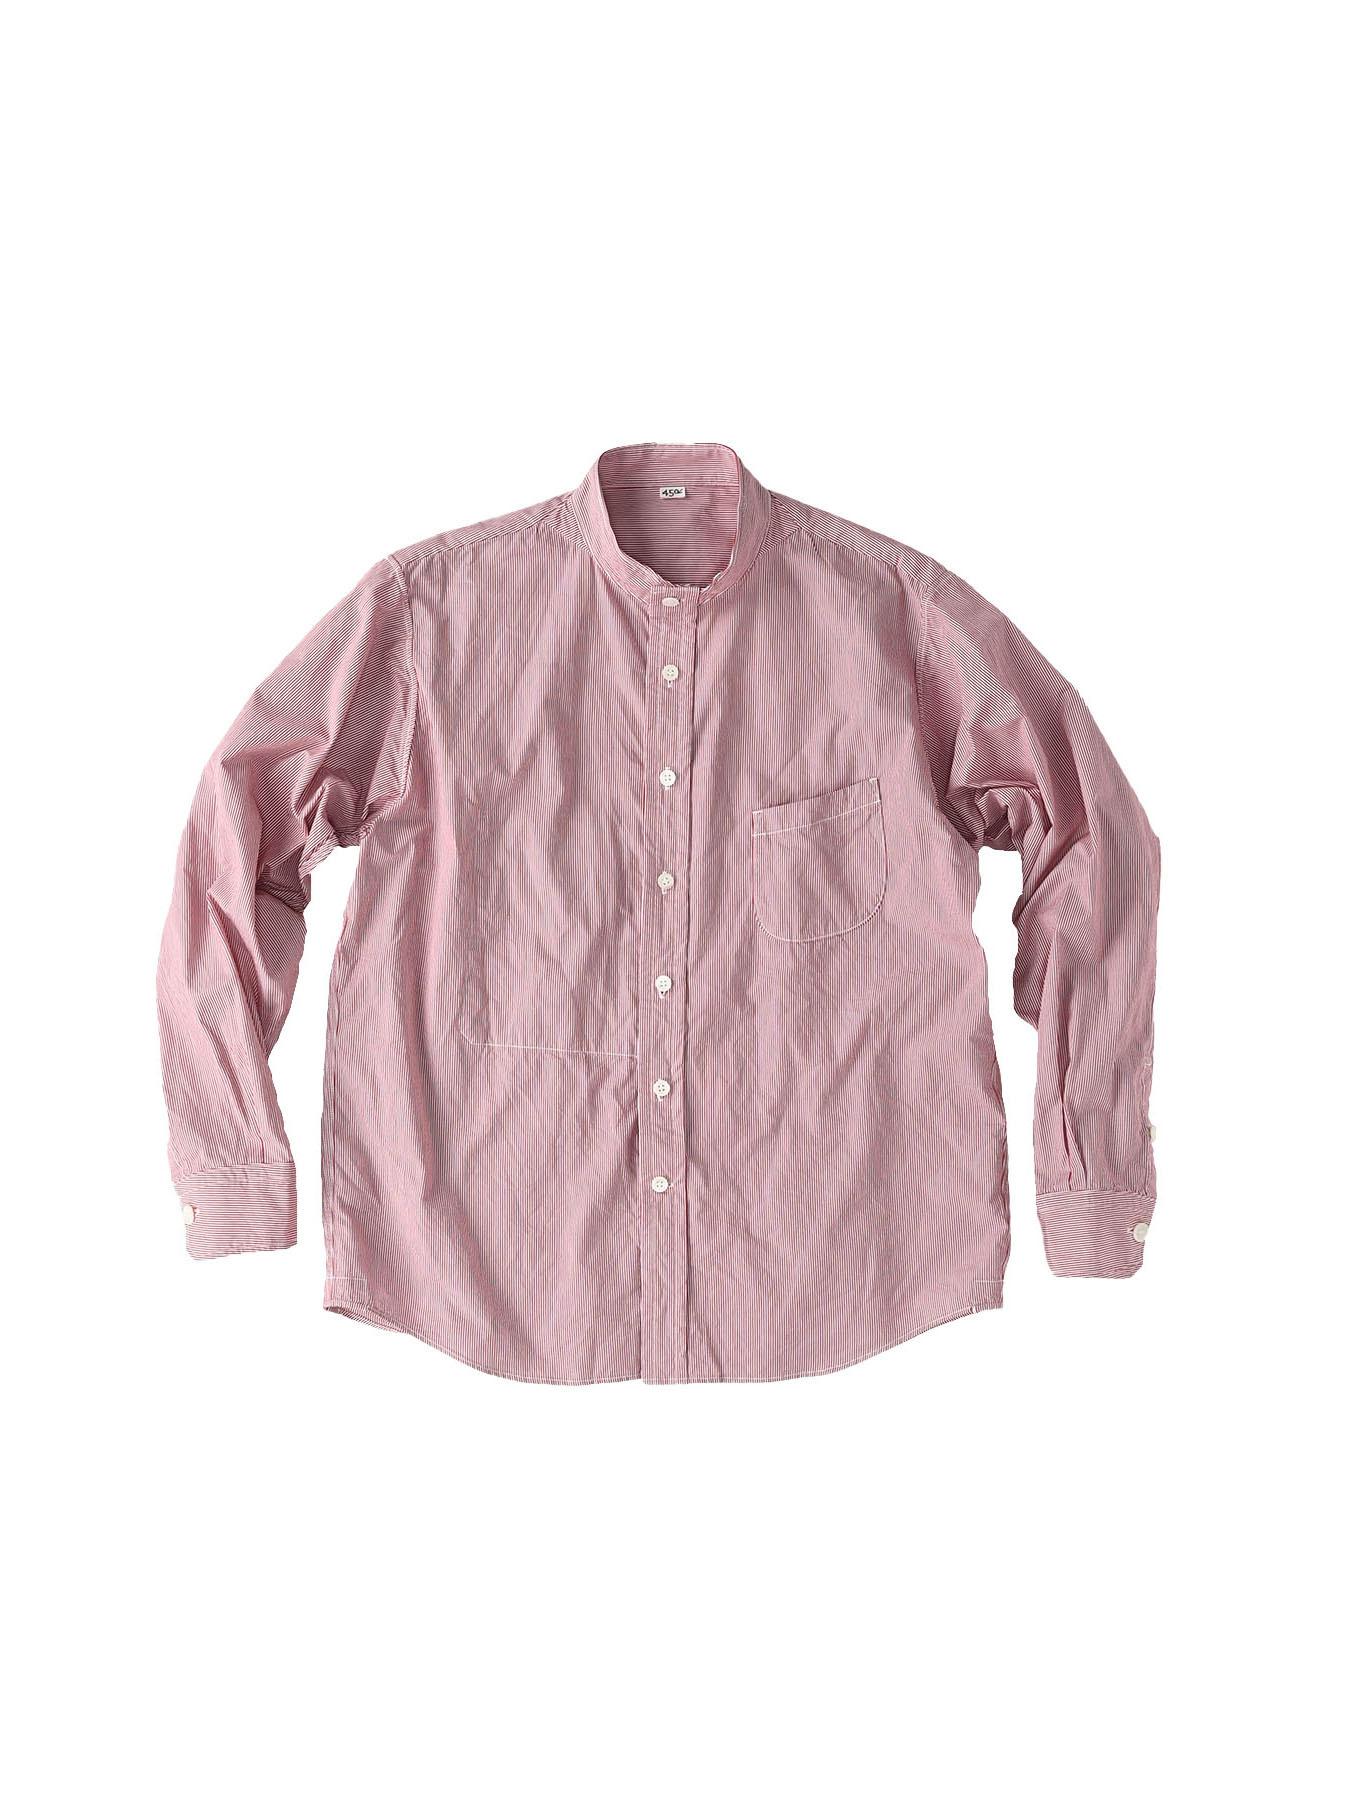 Miko Stand Collar 908 Ocean Shirt-2